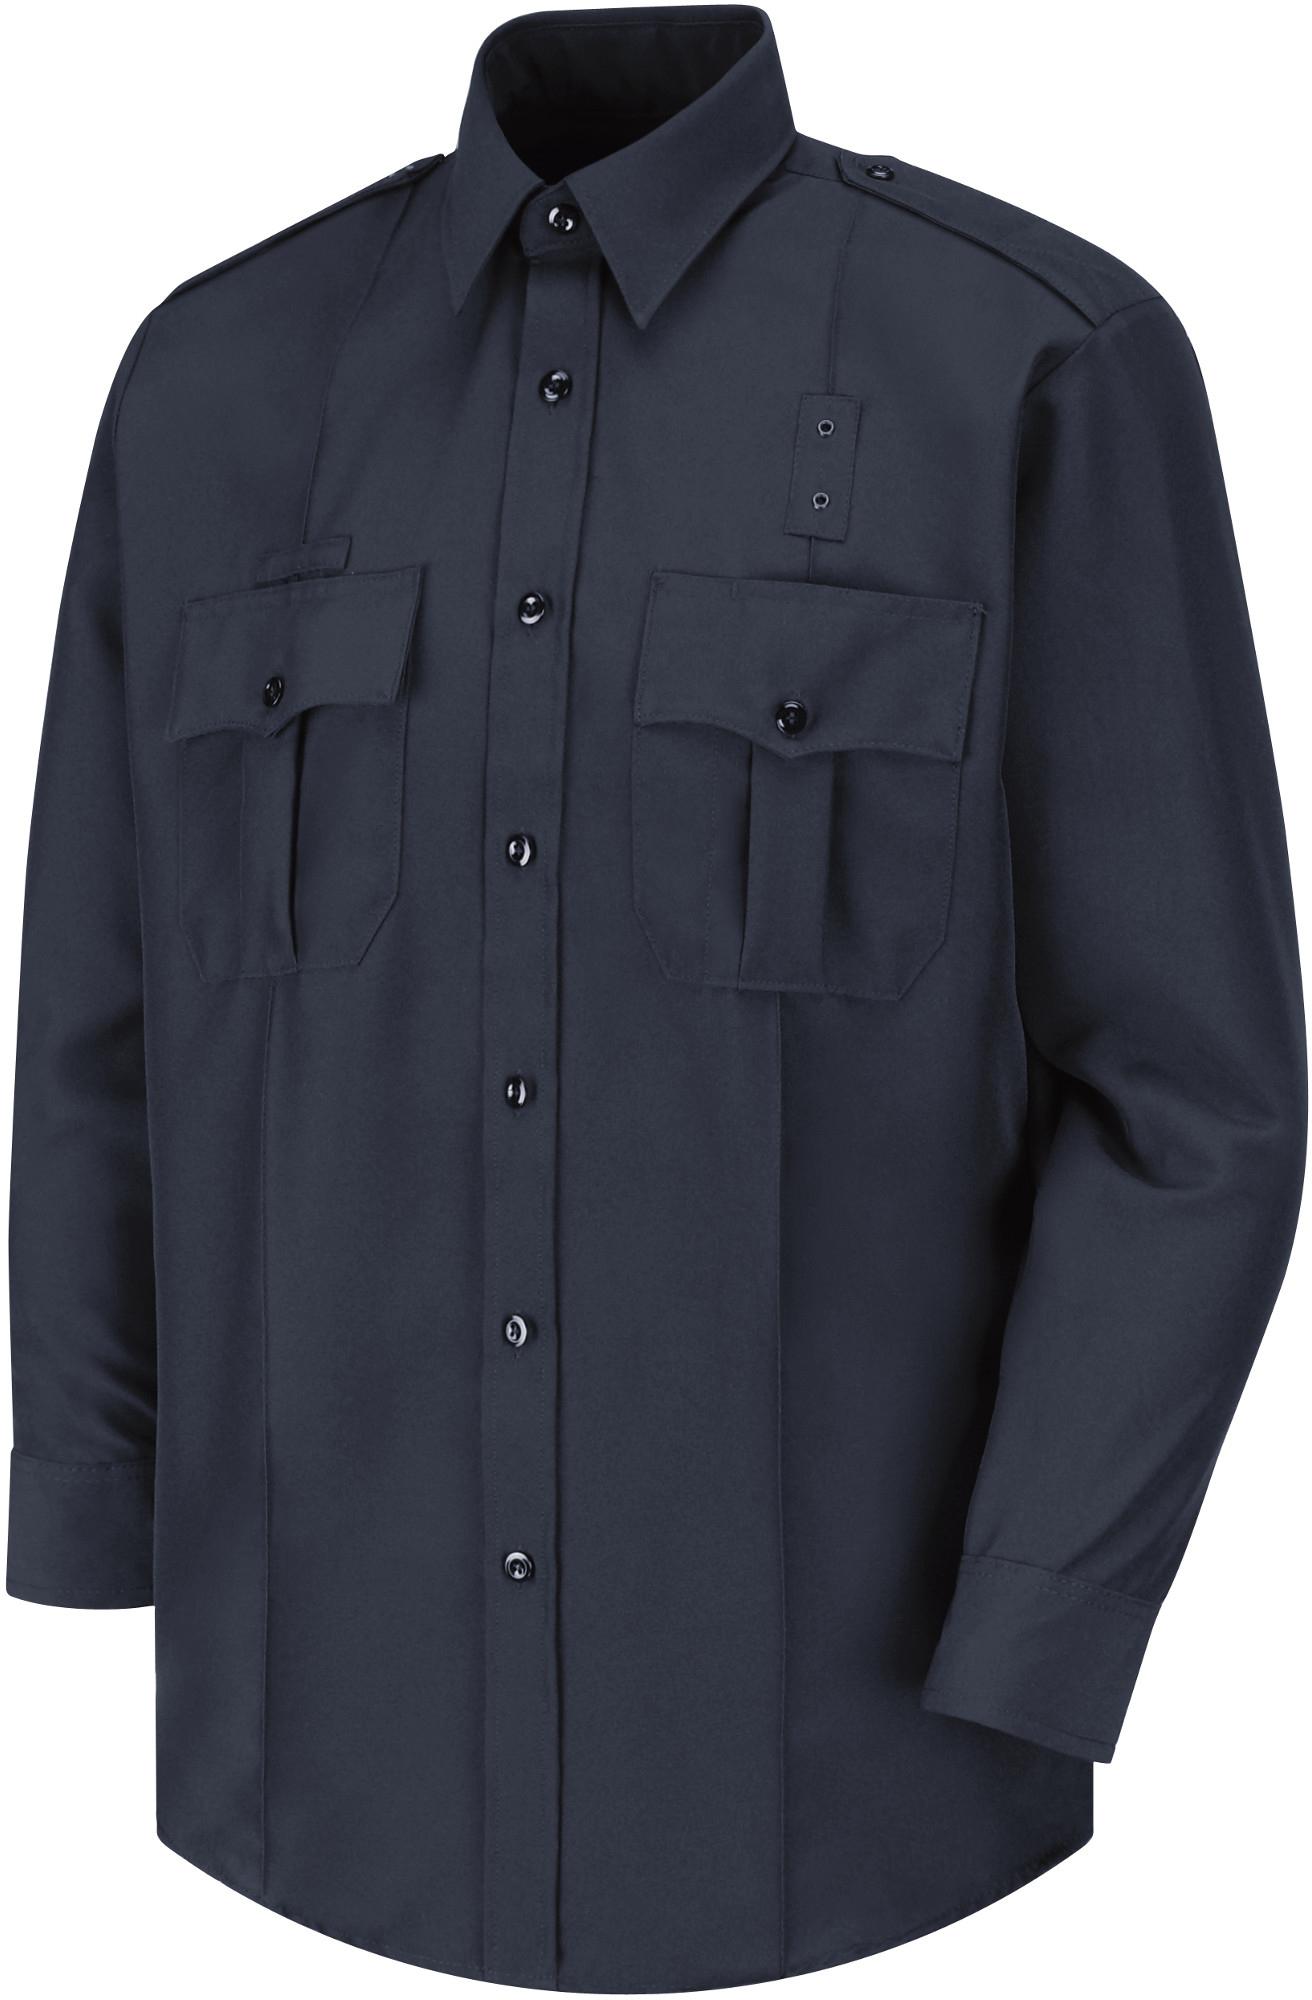 17534 Dark Navy Horace Small Sentry Action Option Shirt